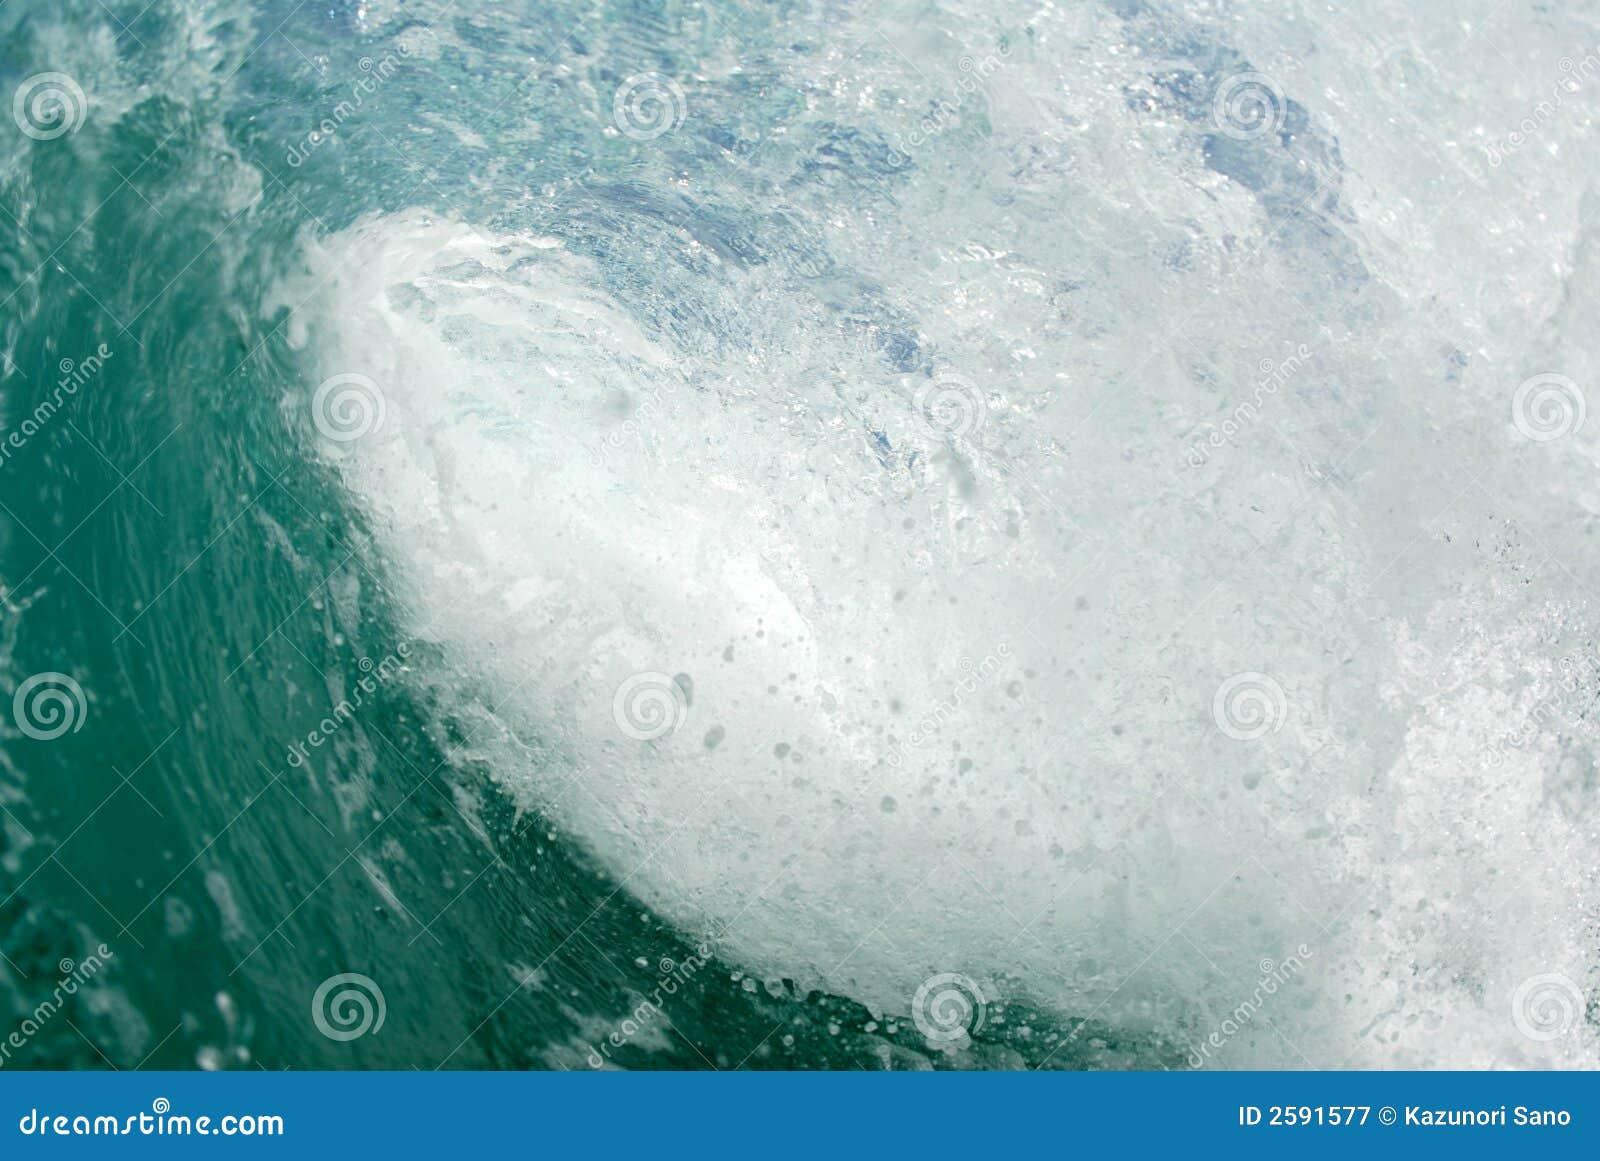 Barrelinginsidawave